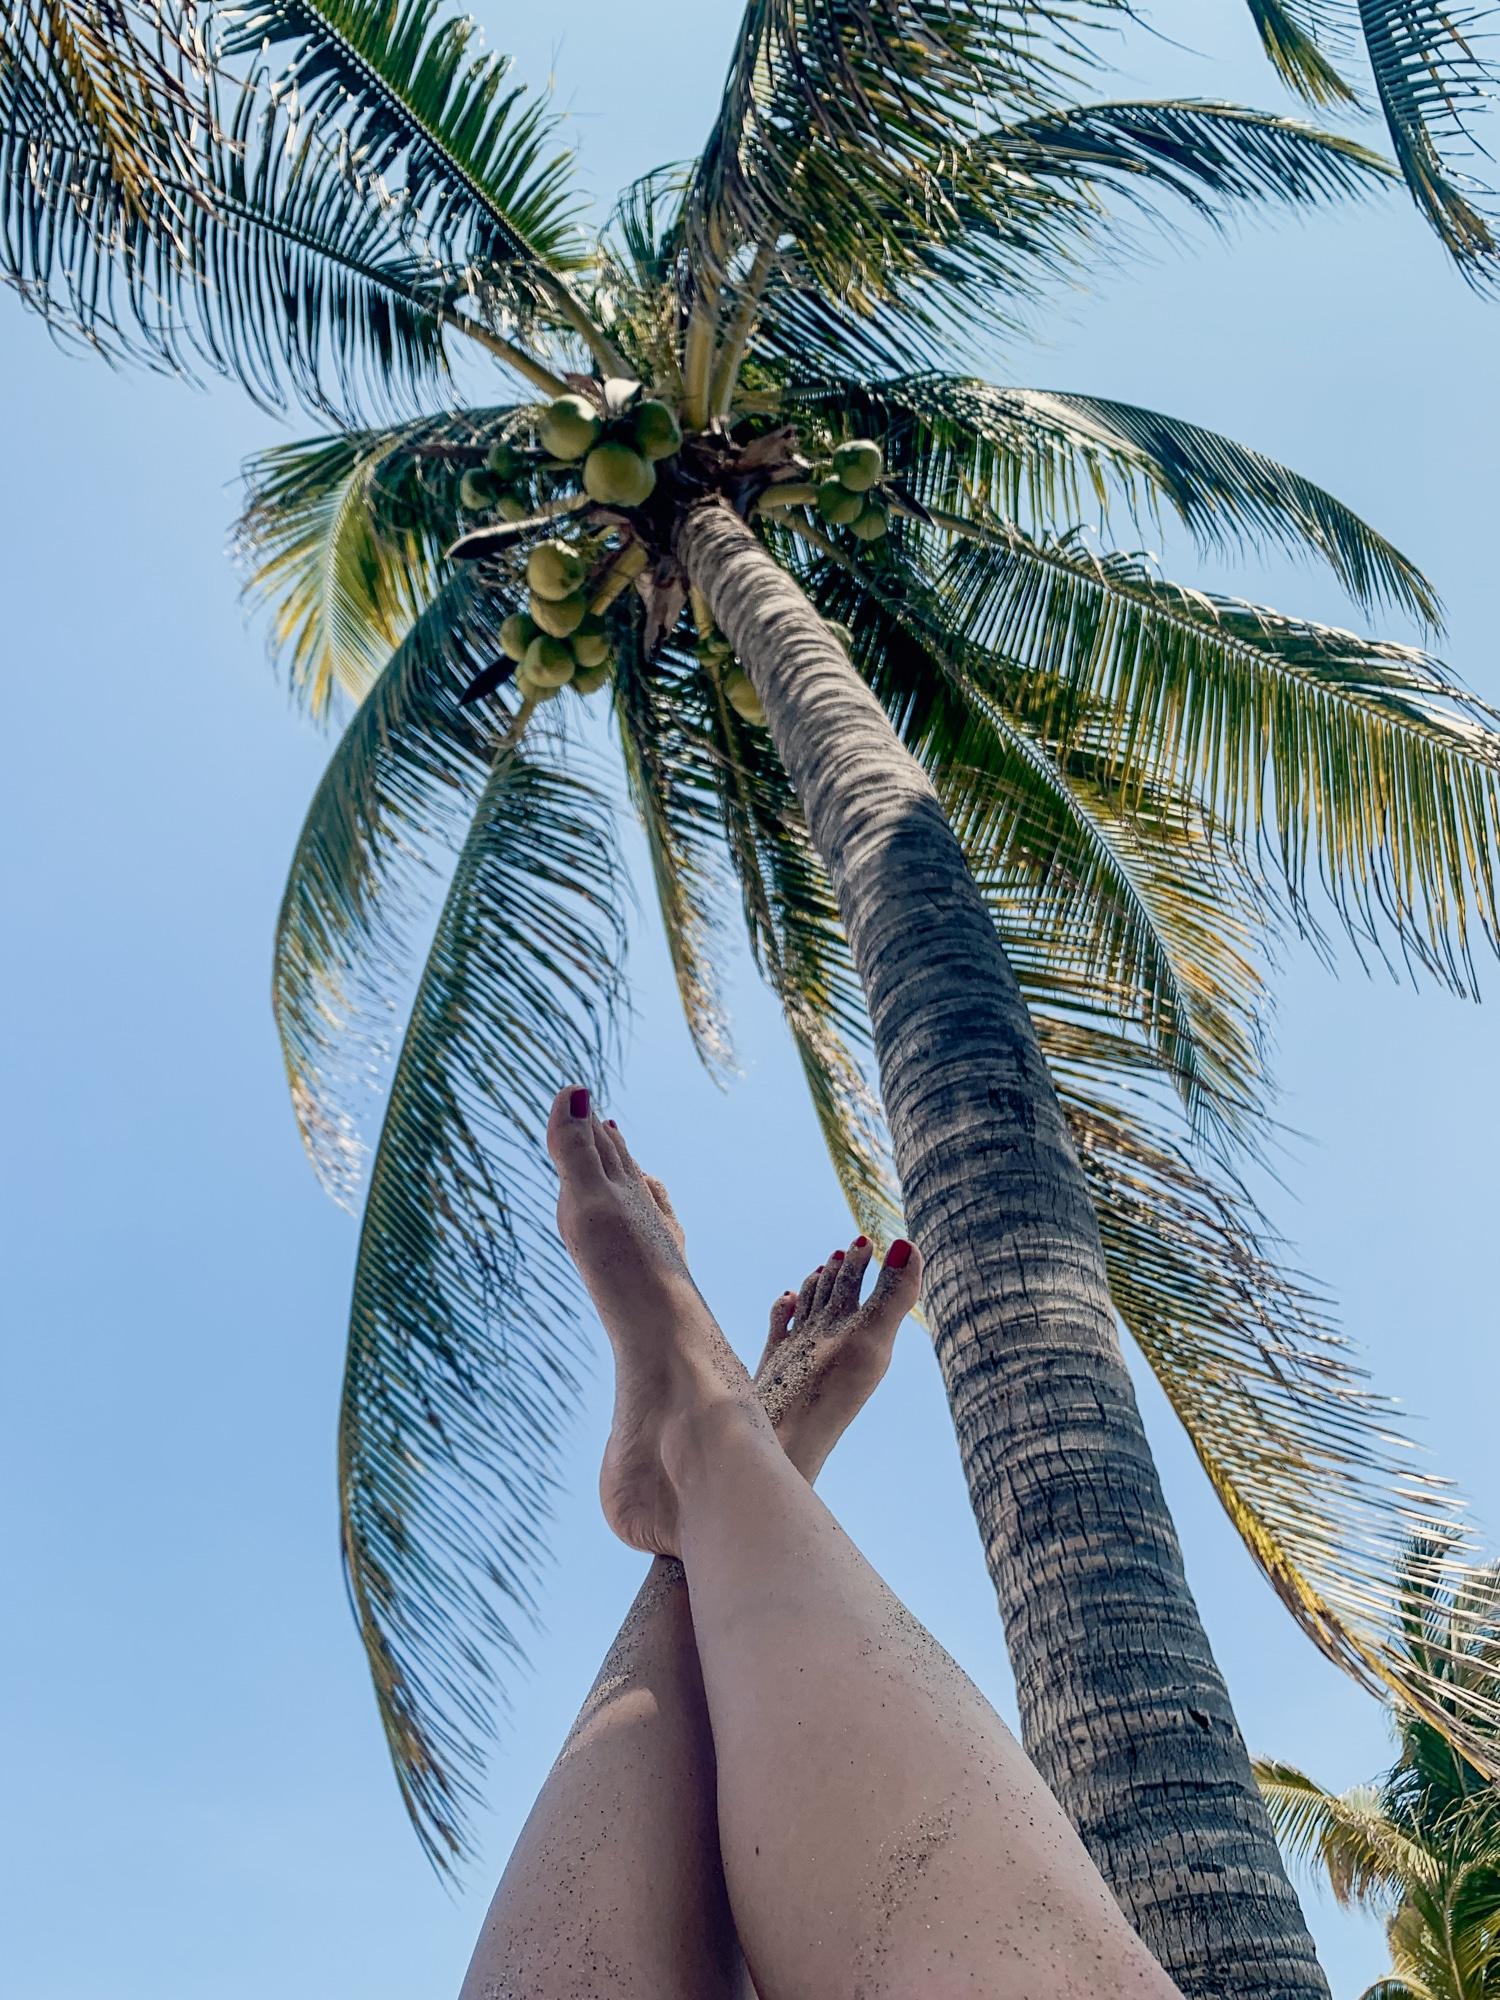 Puerto Escondido: Highlights, Erlebnisse und Ausflugsziele in Mexiko - Playa Zicatela Palmen